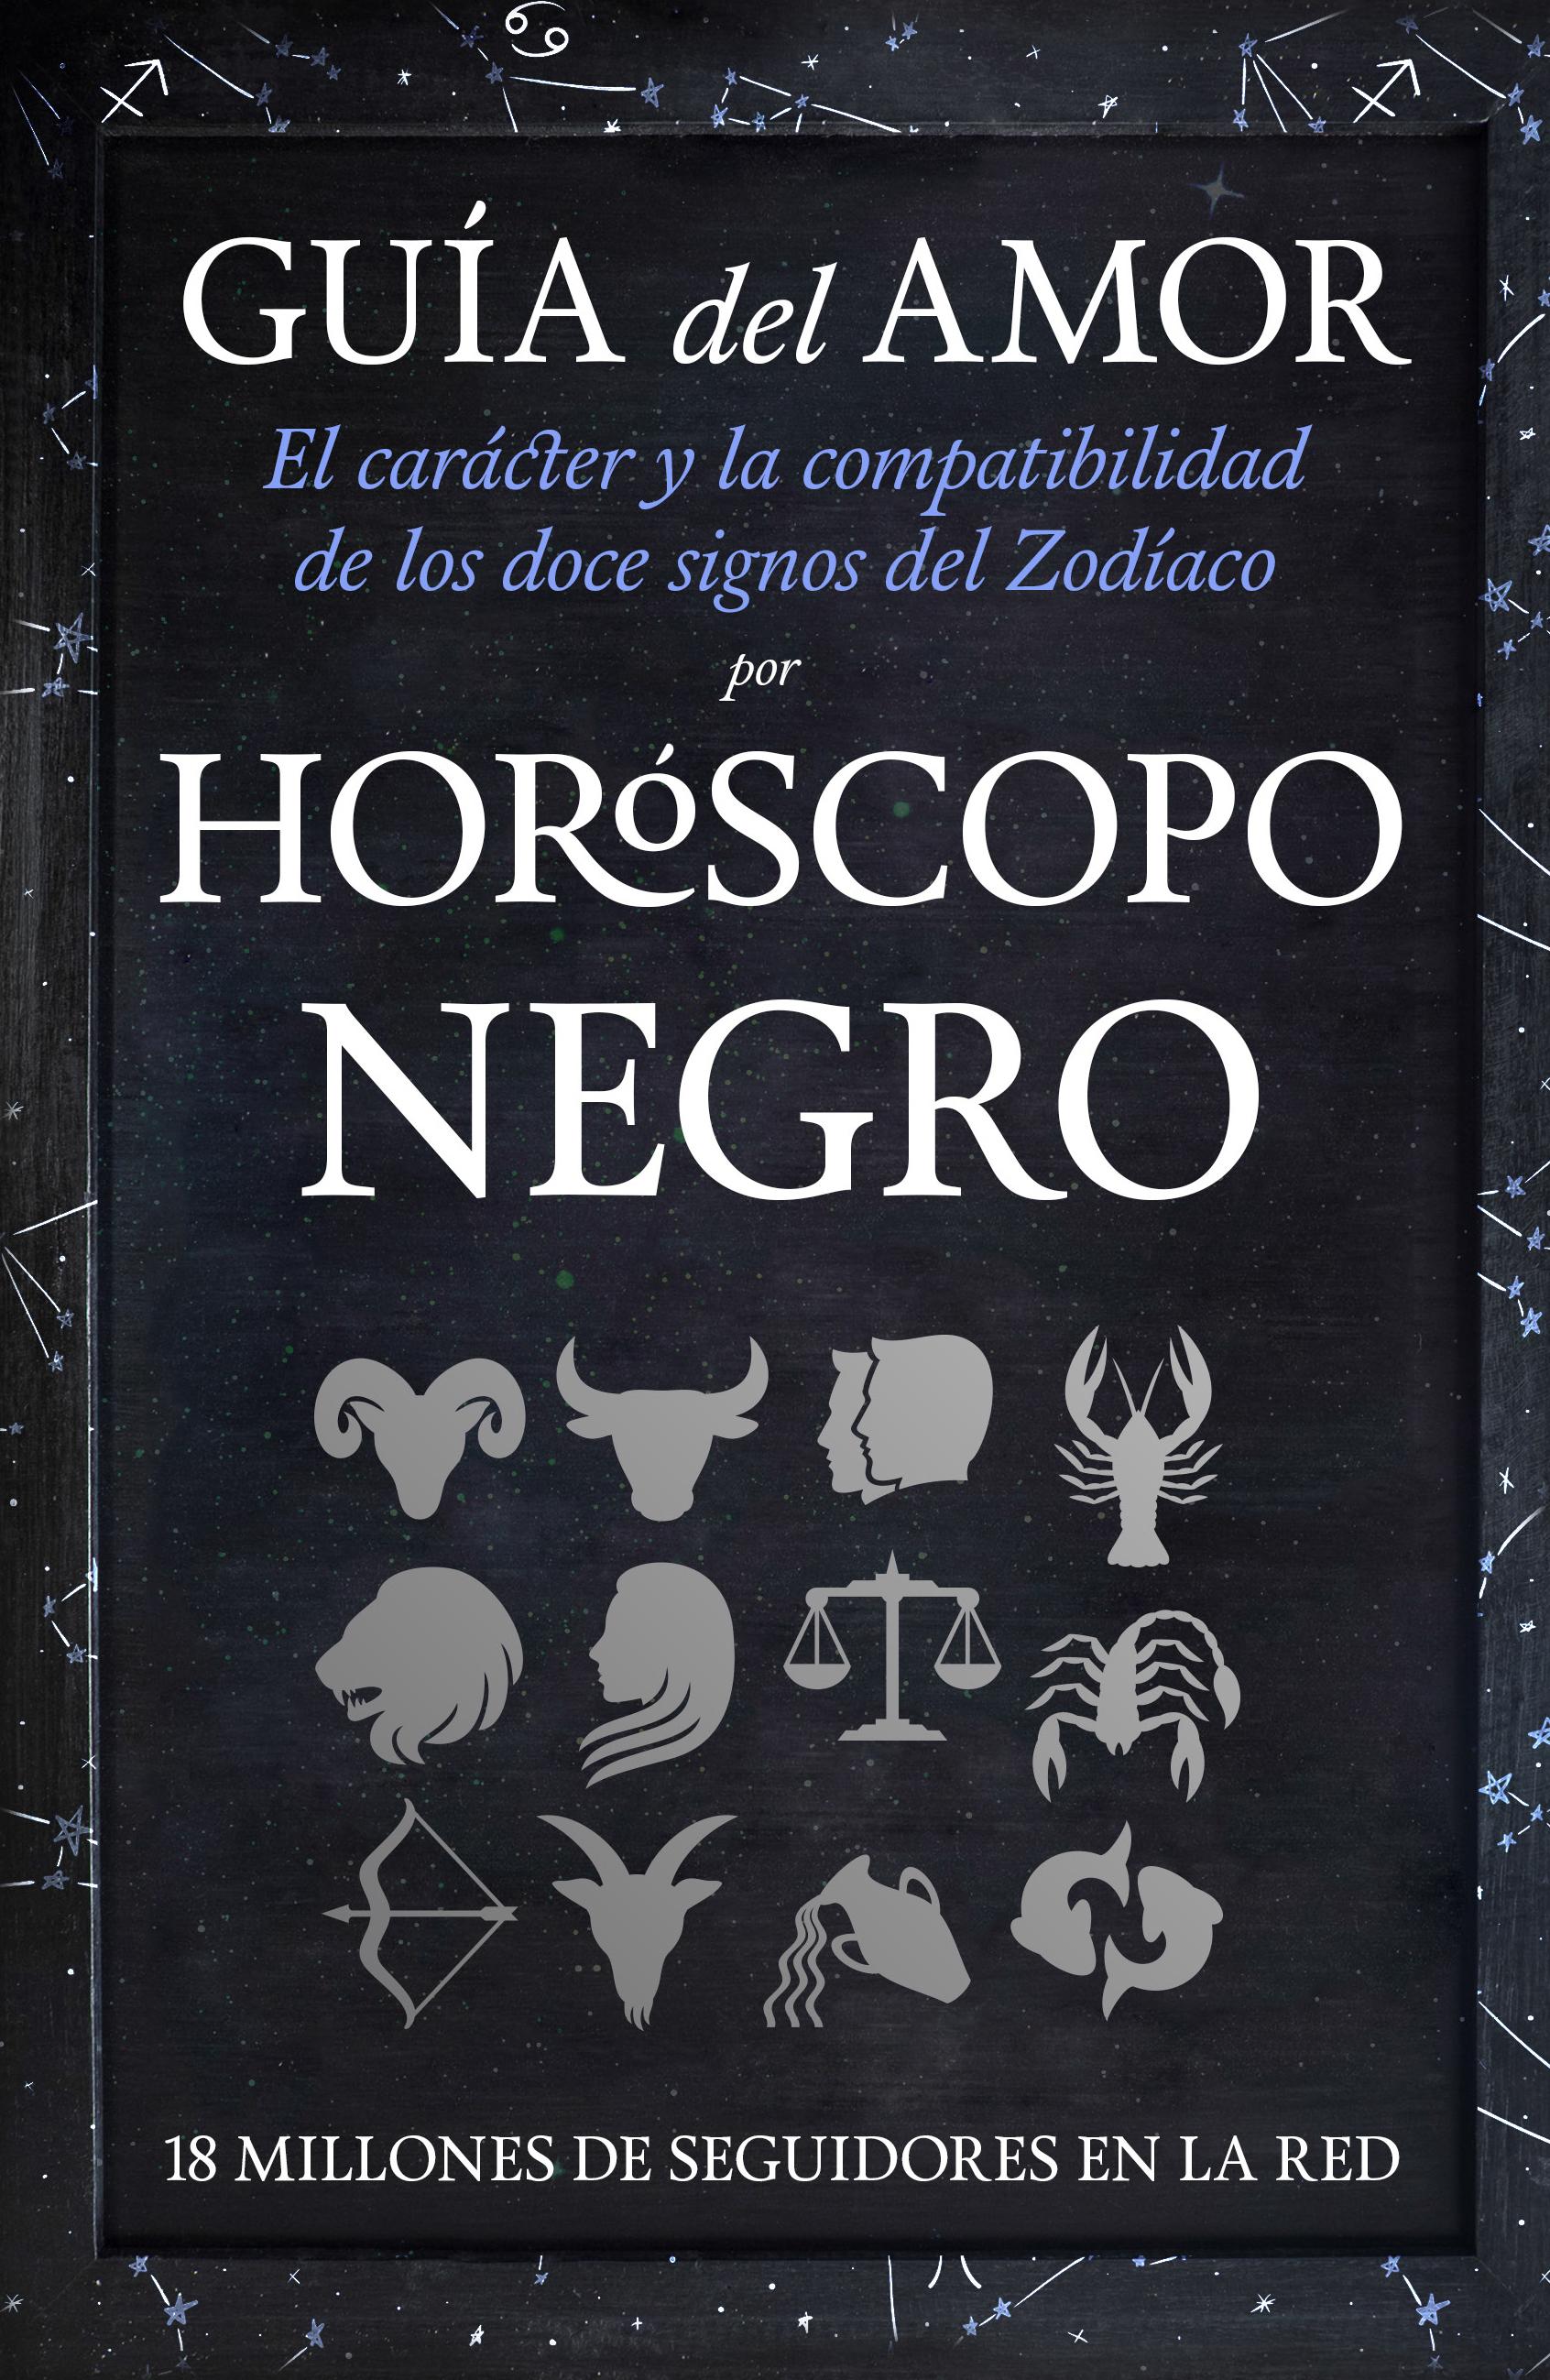 horóscopo negro guía del amor arcopress